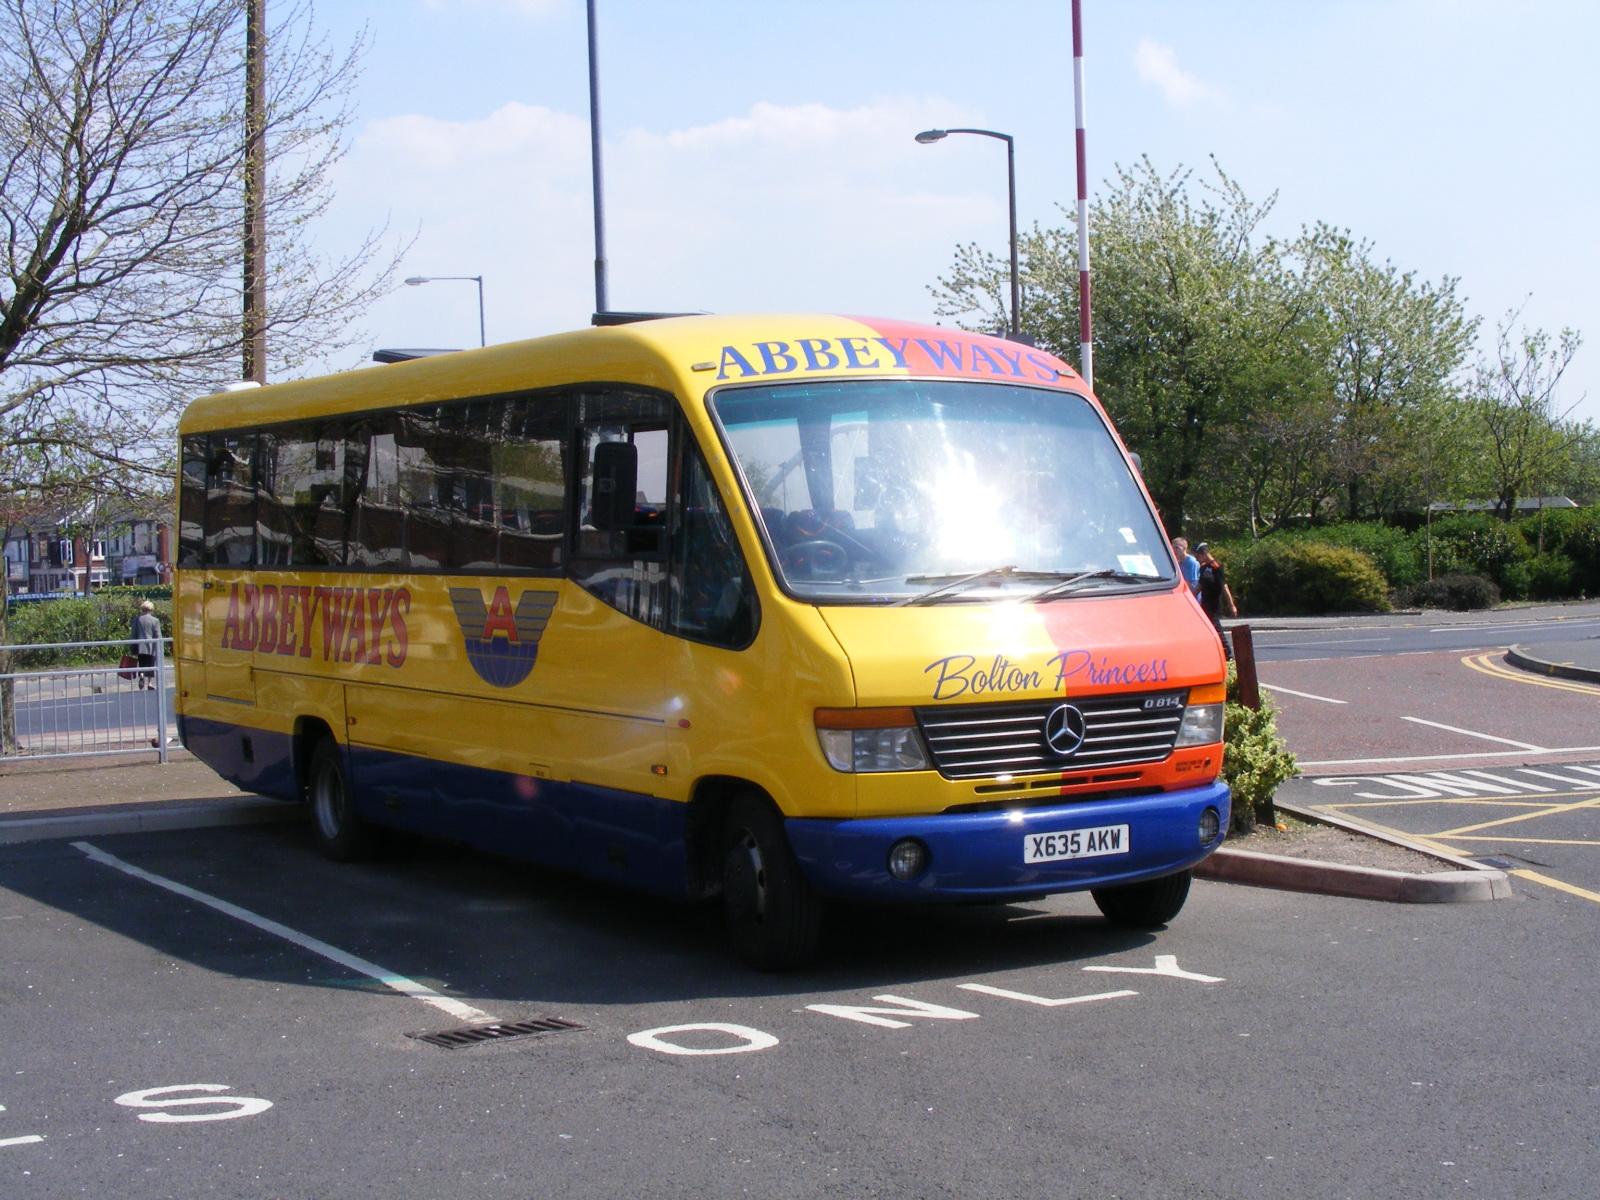 Abbeyways_bus_(X835_AKW),_6_May_2008_(1).jpg